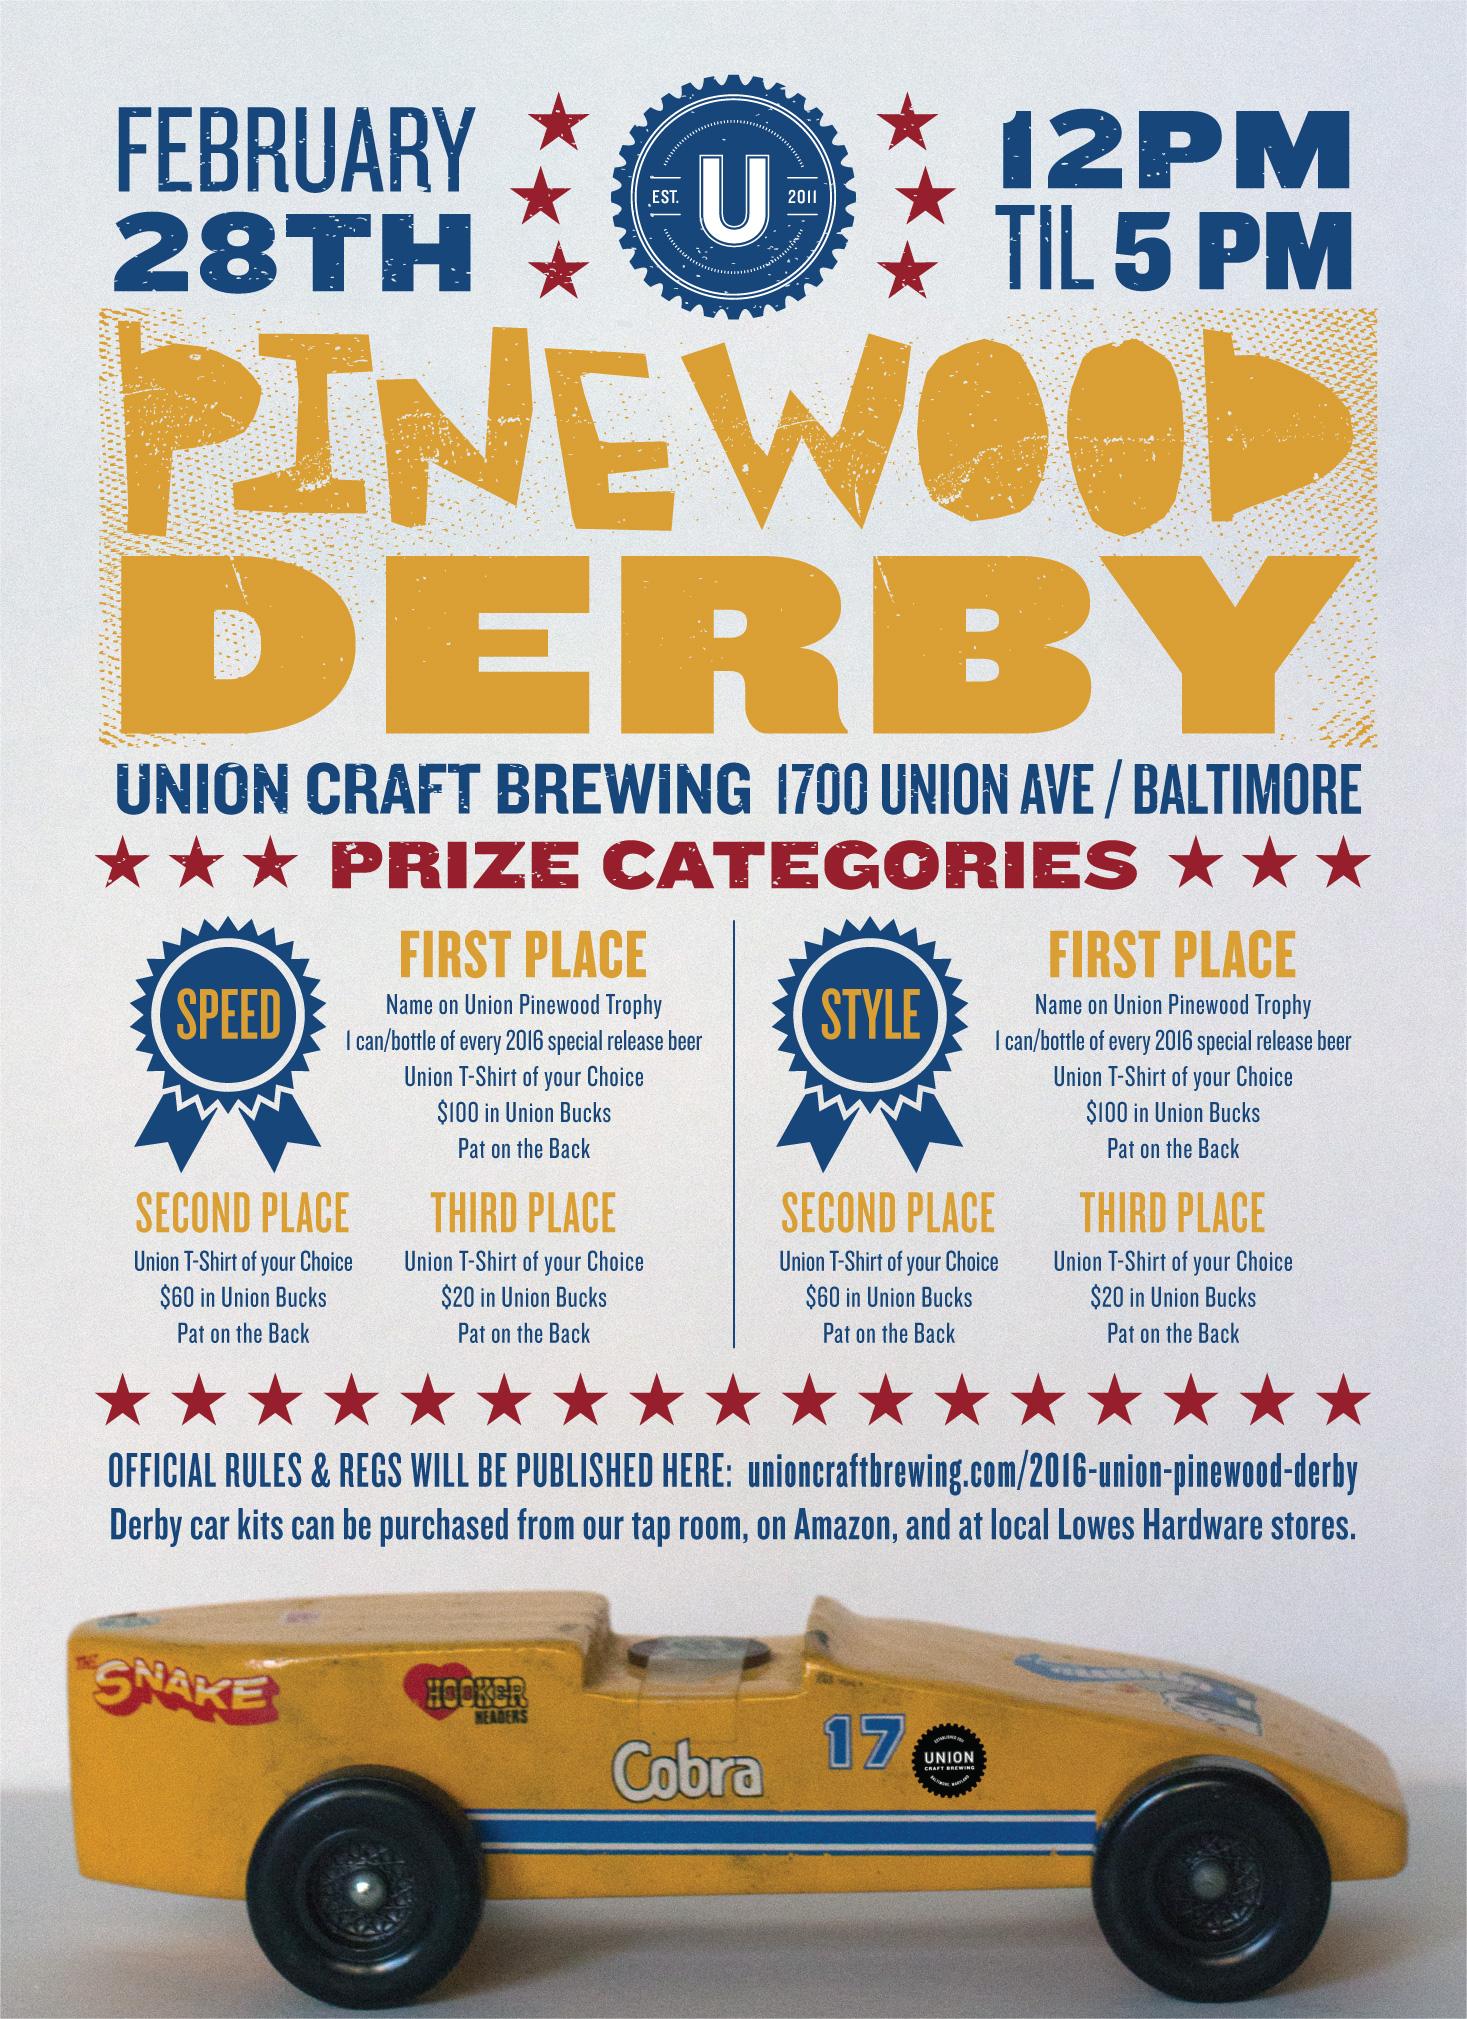 Union Craft Brewing 2016 UNION PINEWOOD DERBY